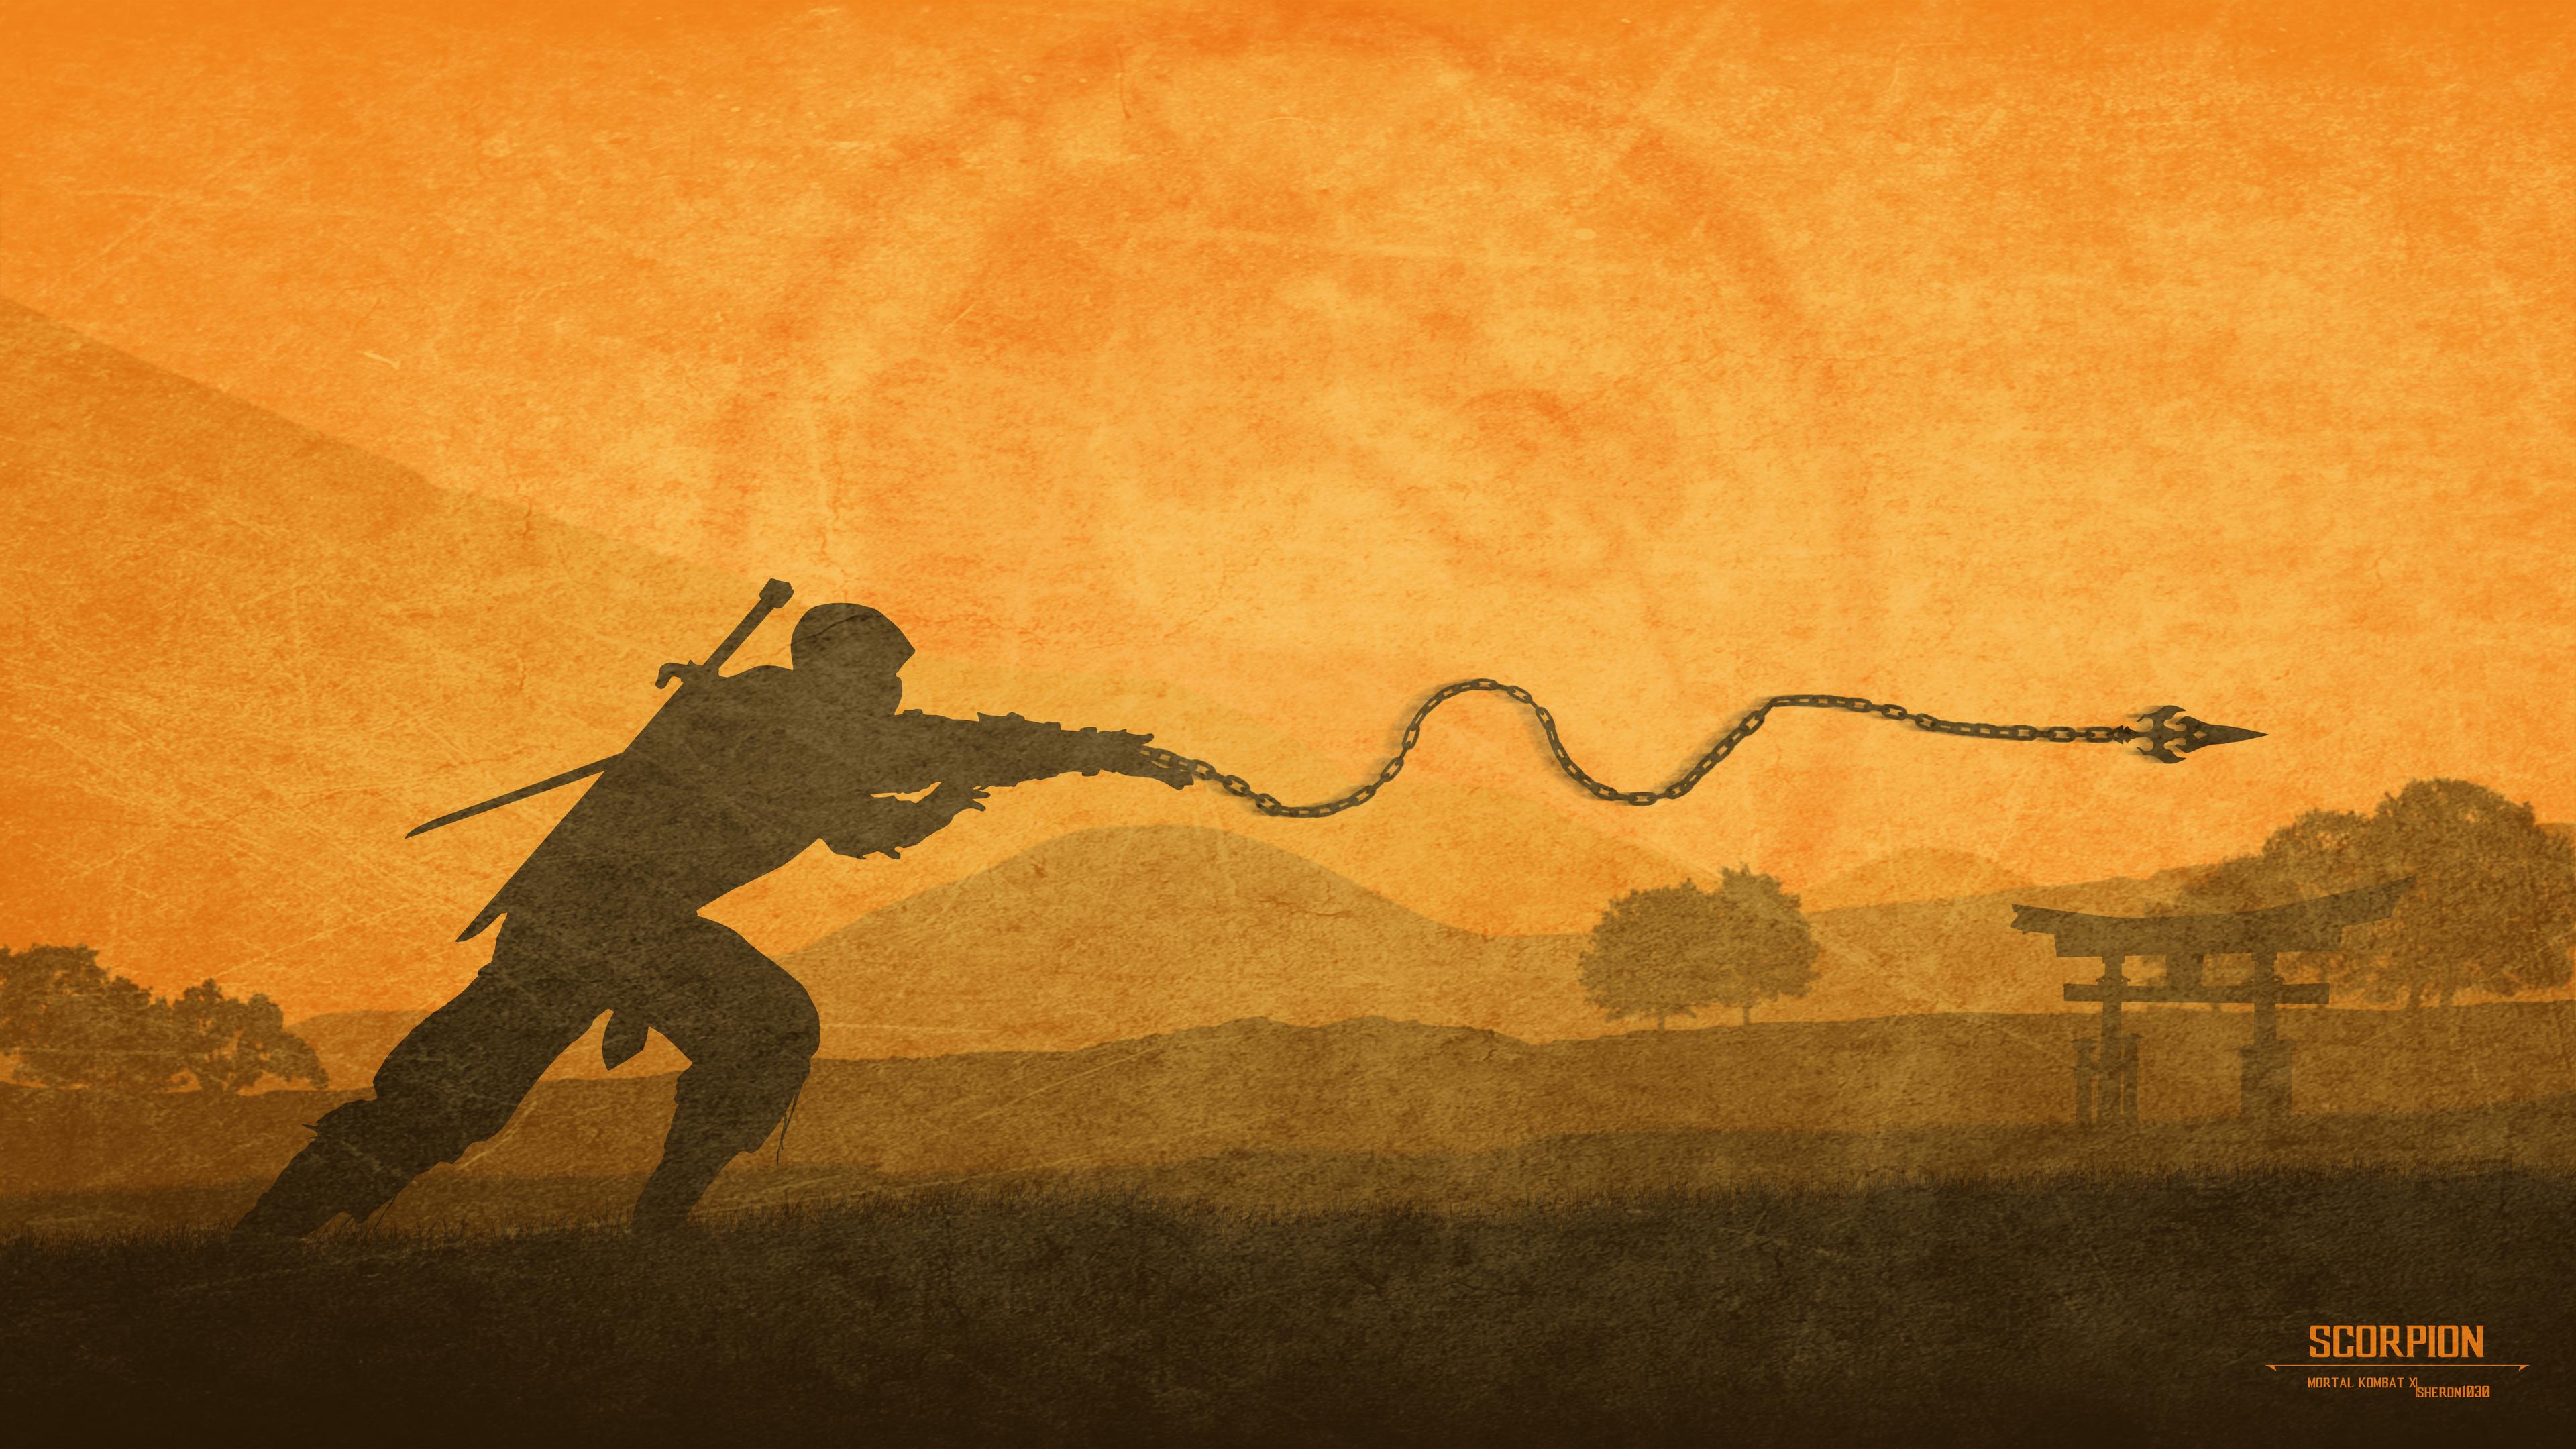 Wallpaper 4k Mortal Kombat X Scorpion 4k 4k Wallpapers 5k